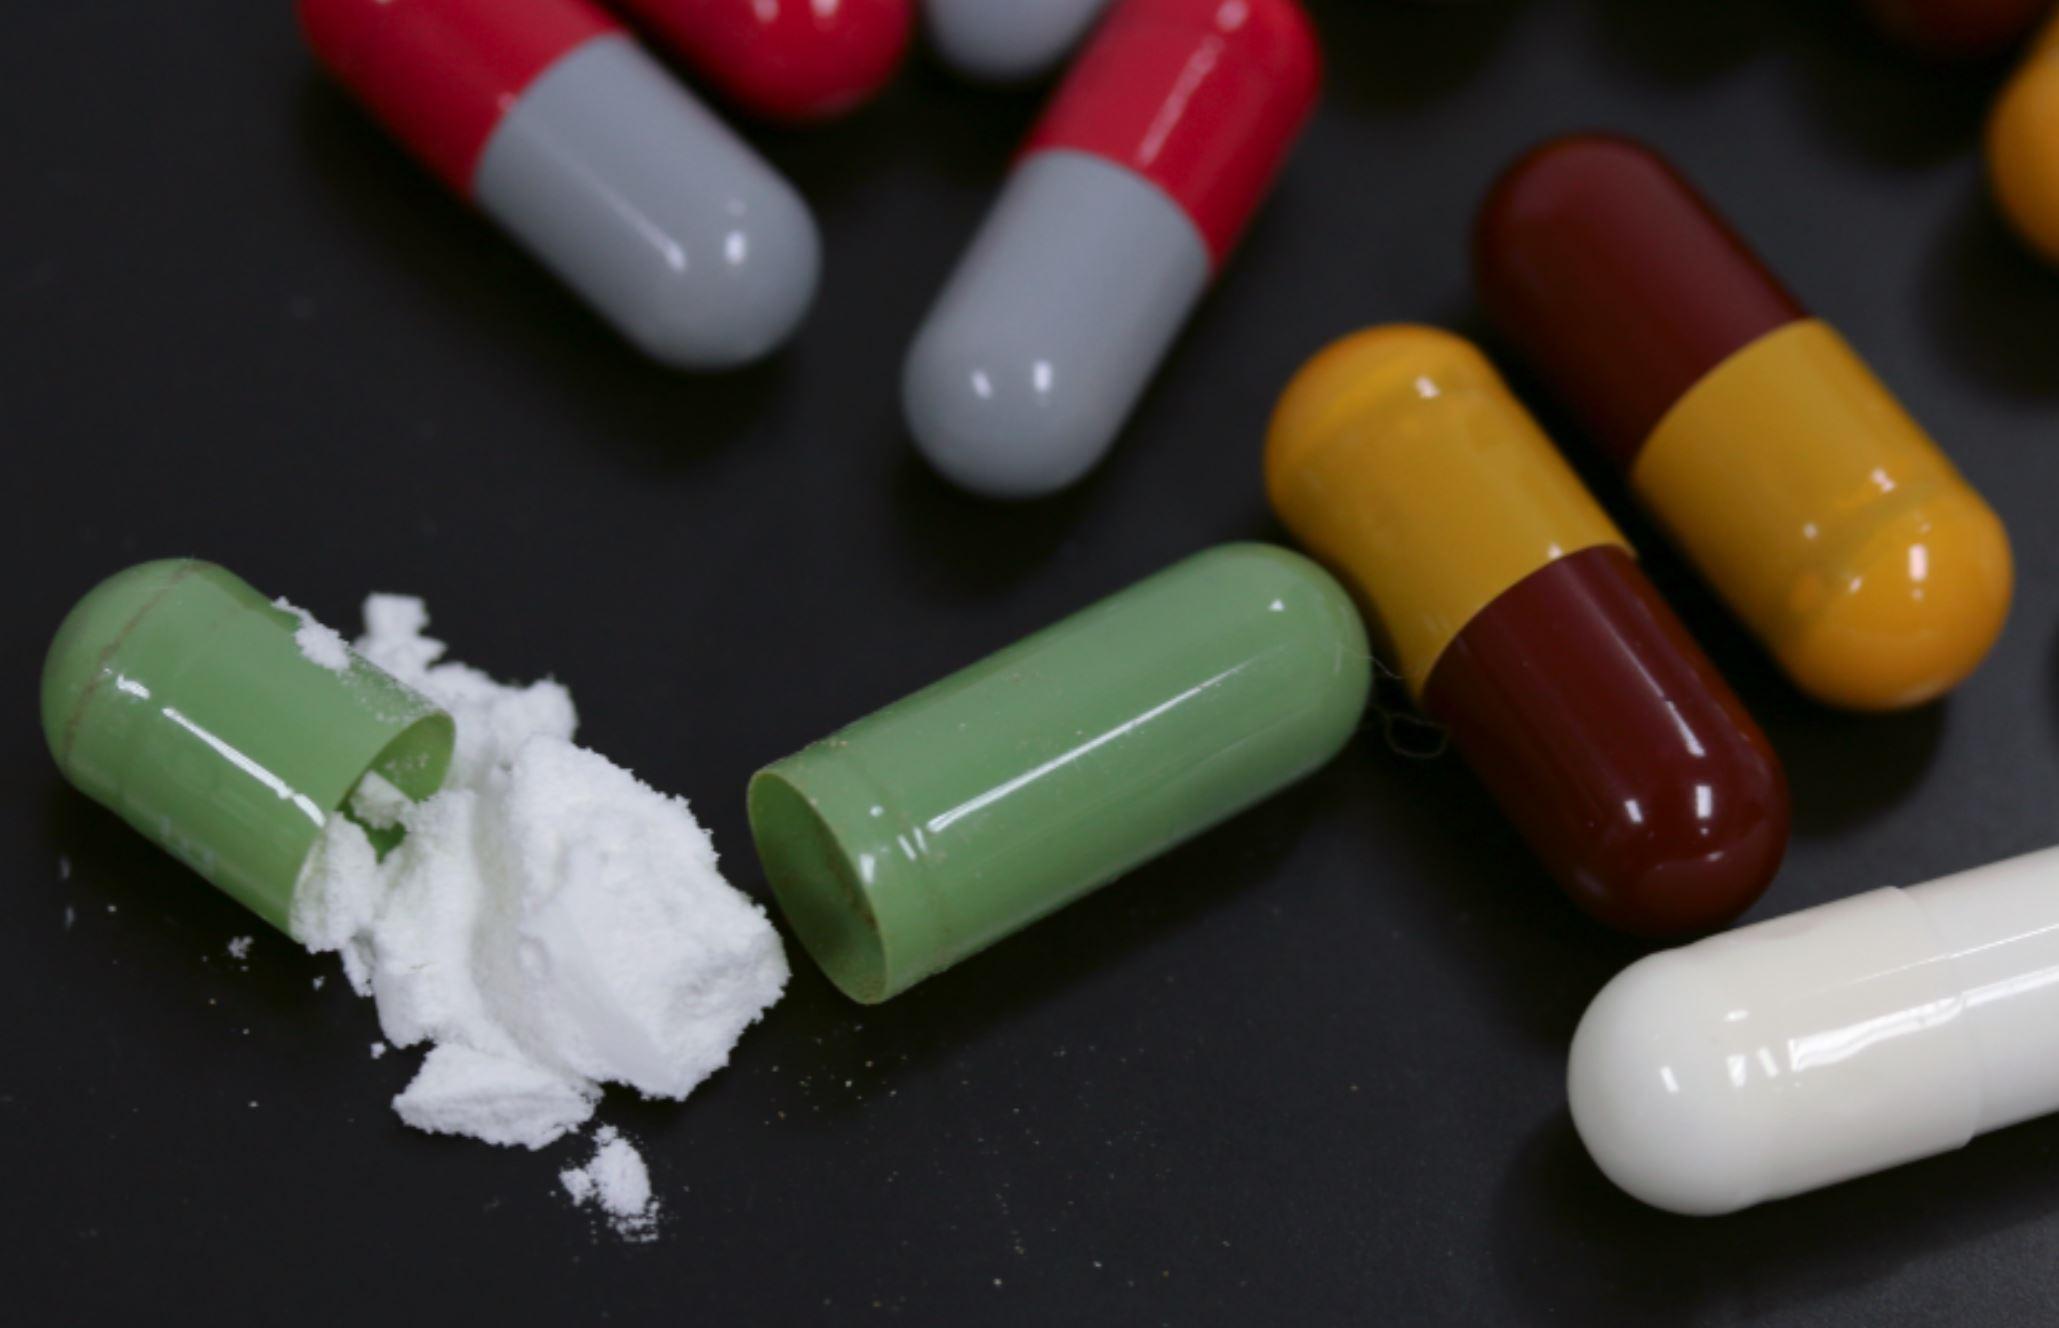 counterfeit-drugs.jpg